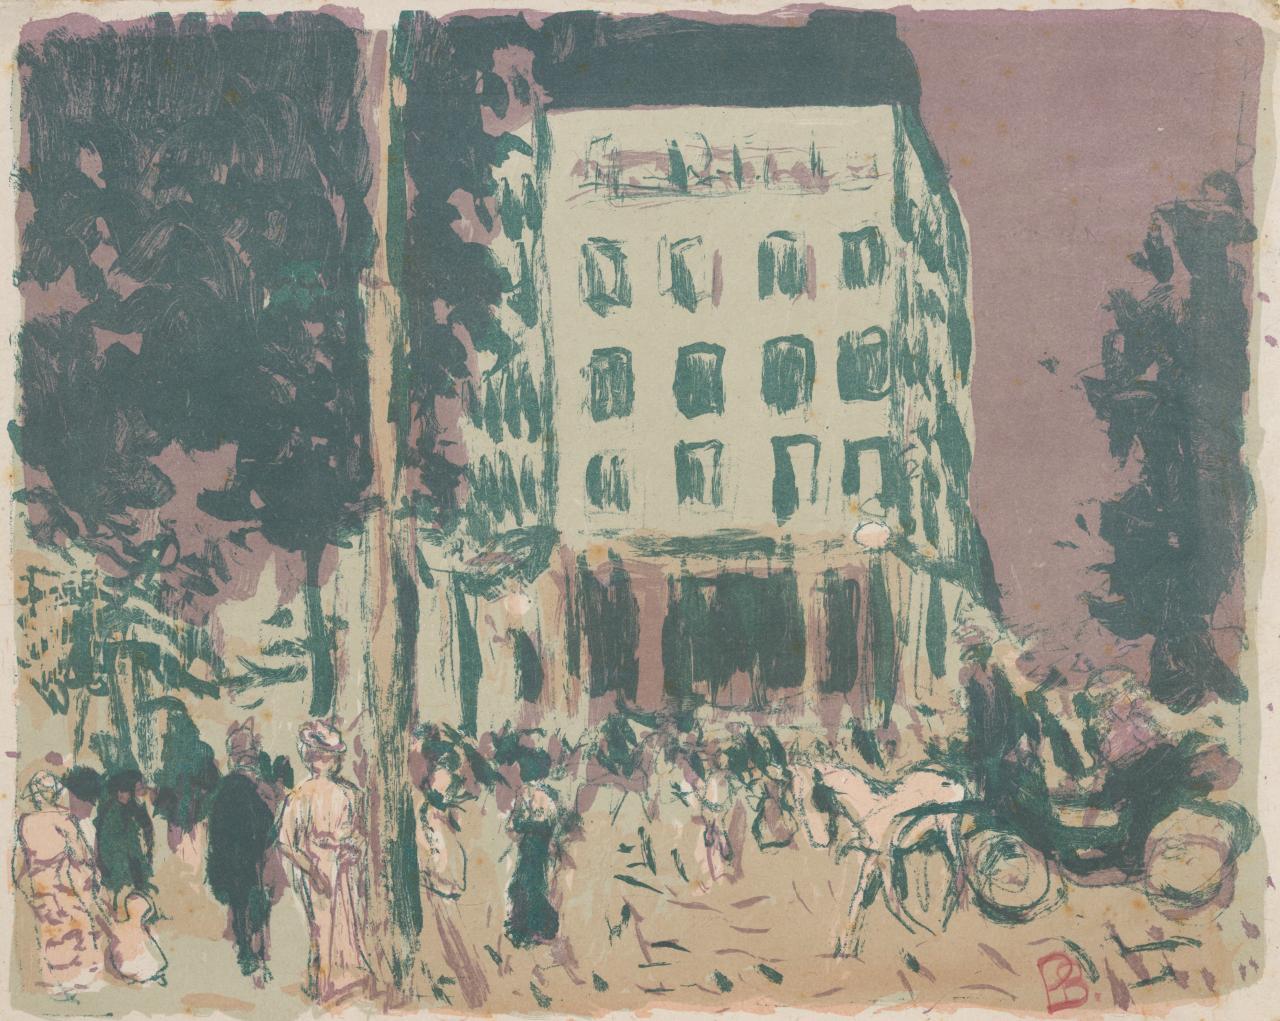 Street scene les boulevards 1900 published in das mappenwerk der insel insel verlag leipzig 1900 pierre bonnard